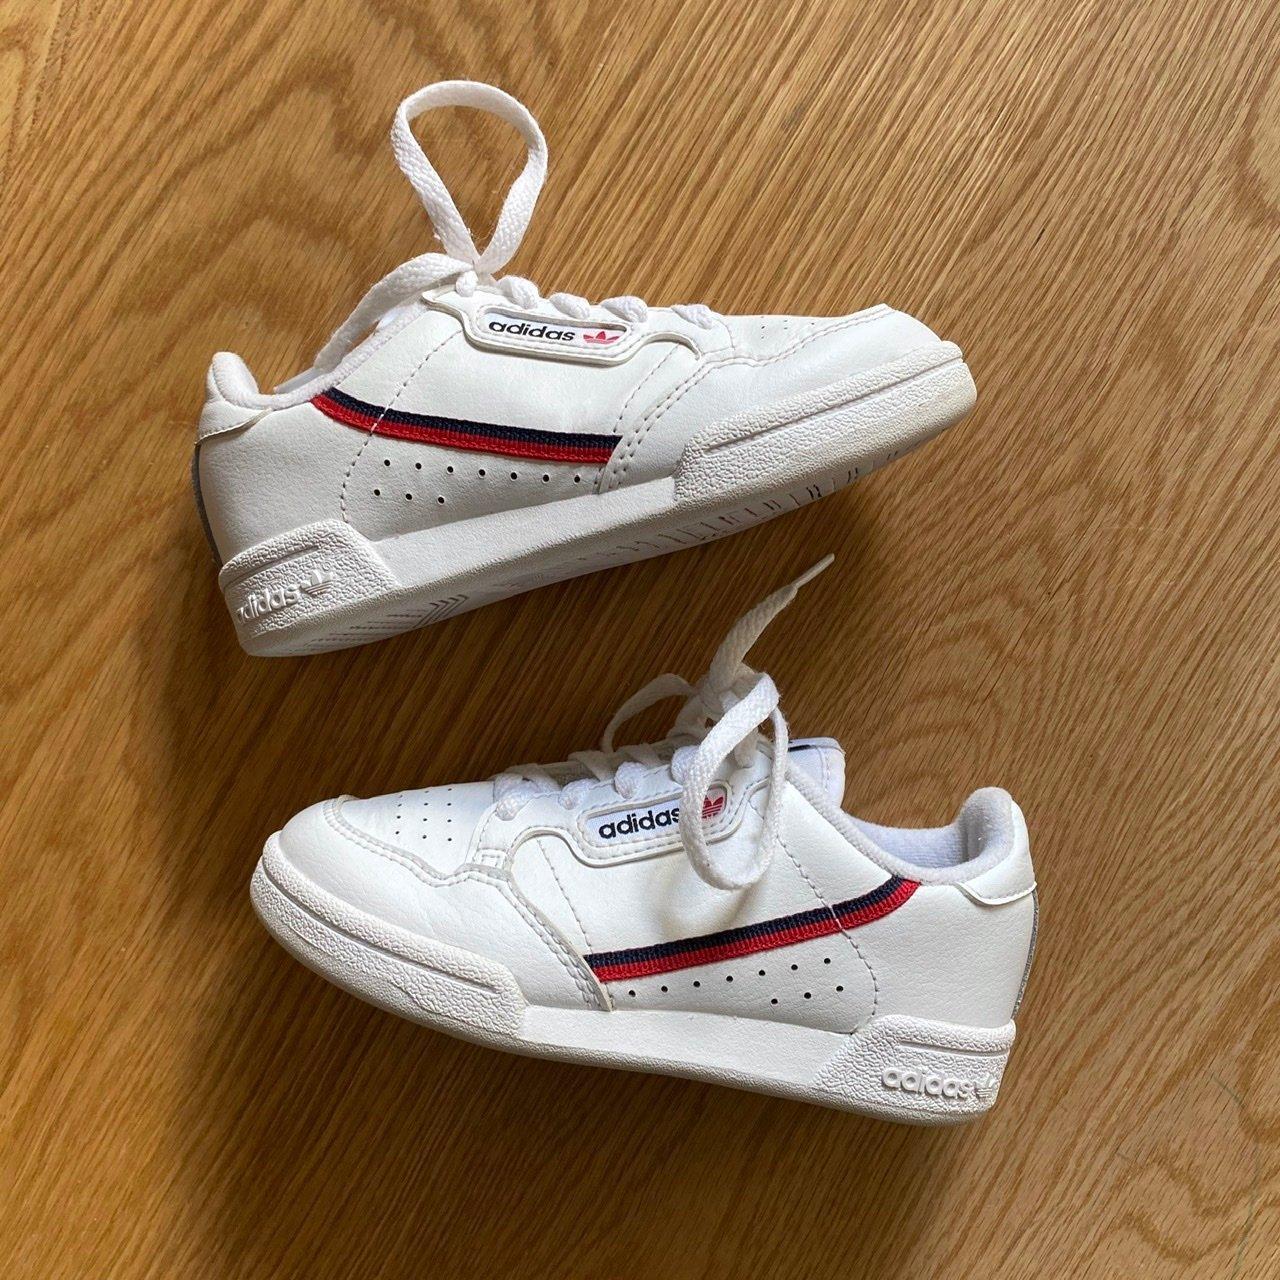 Adidas skor storlek 28 (175 mm)